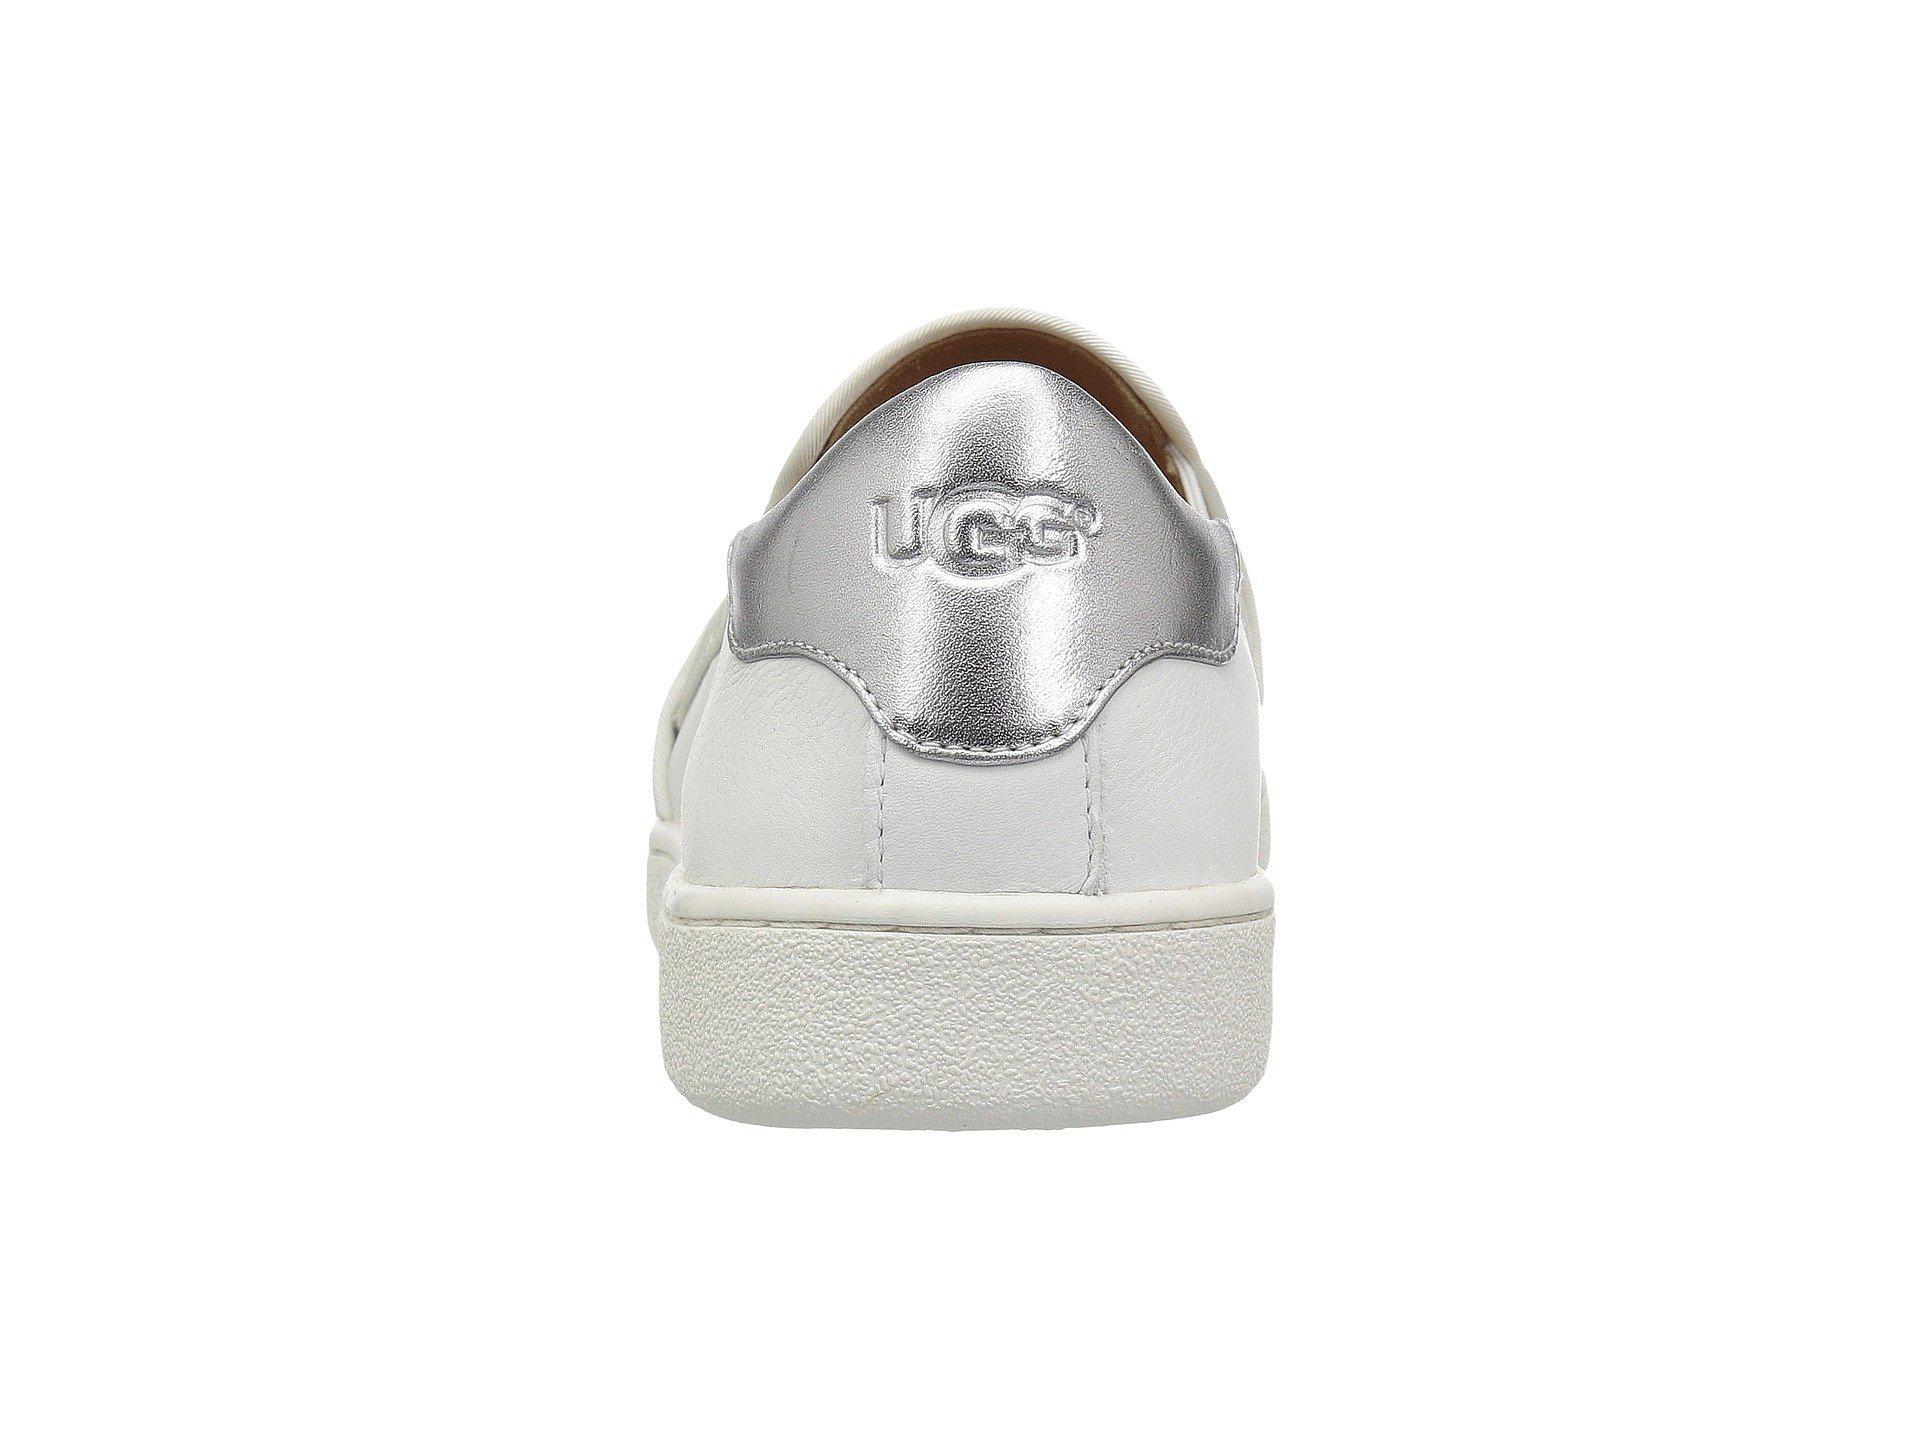 UGG Leather Cas Slip-on Cas Slip-on in